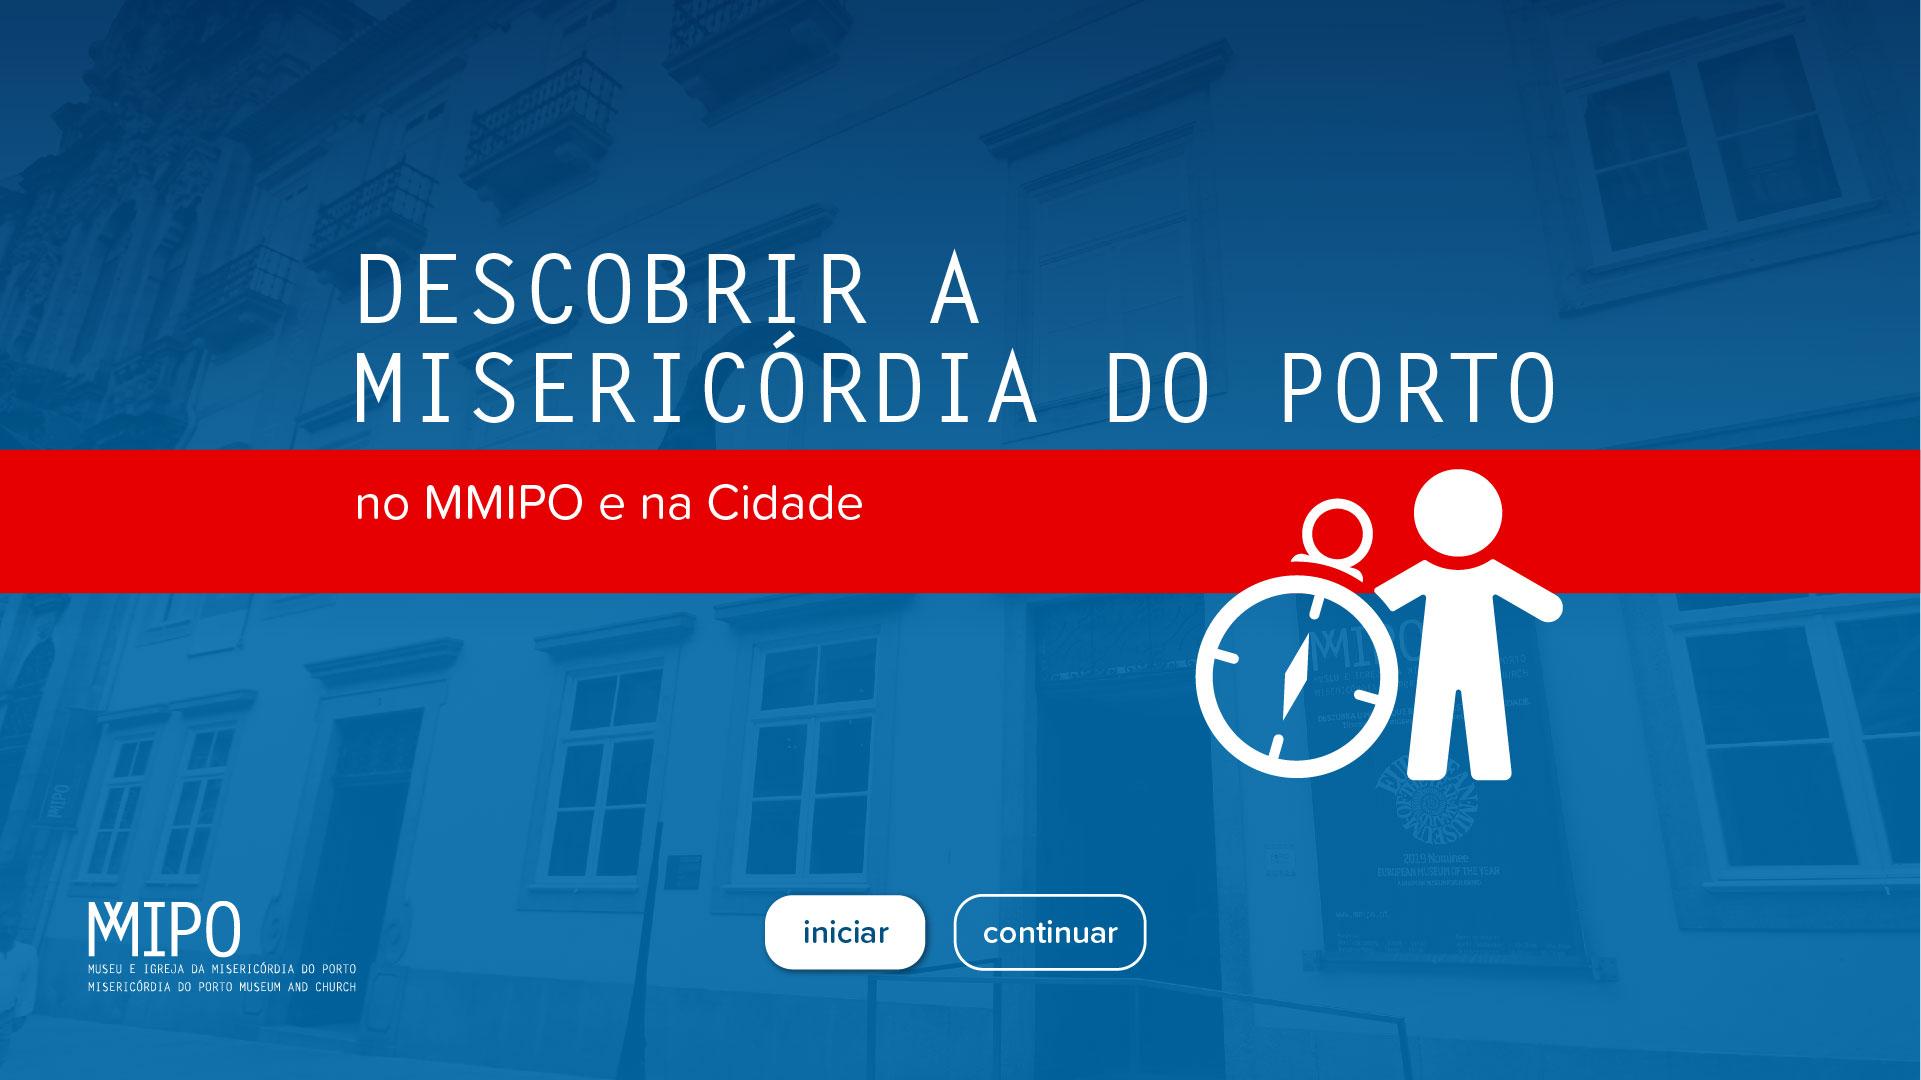 http://www.mmipo.pt/assets/misc/slideshow/2019/maquete_1_3_1.jpg